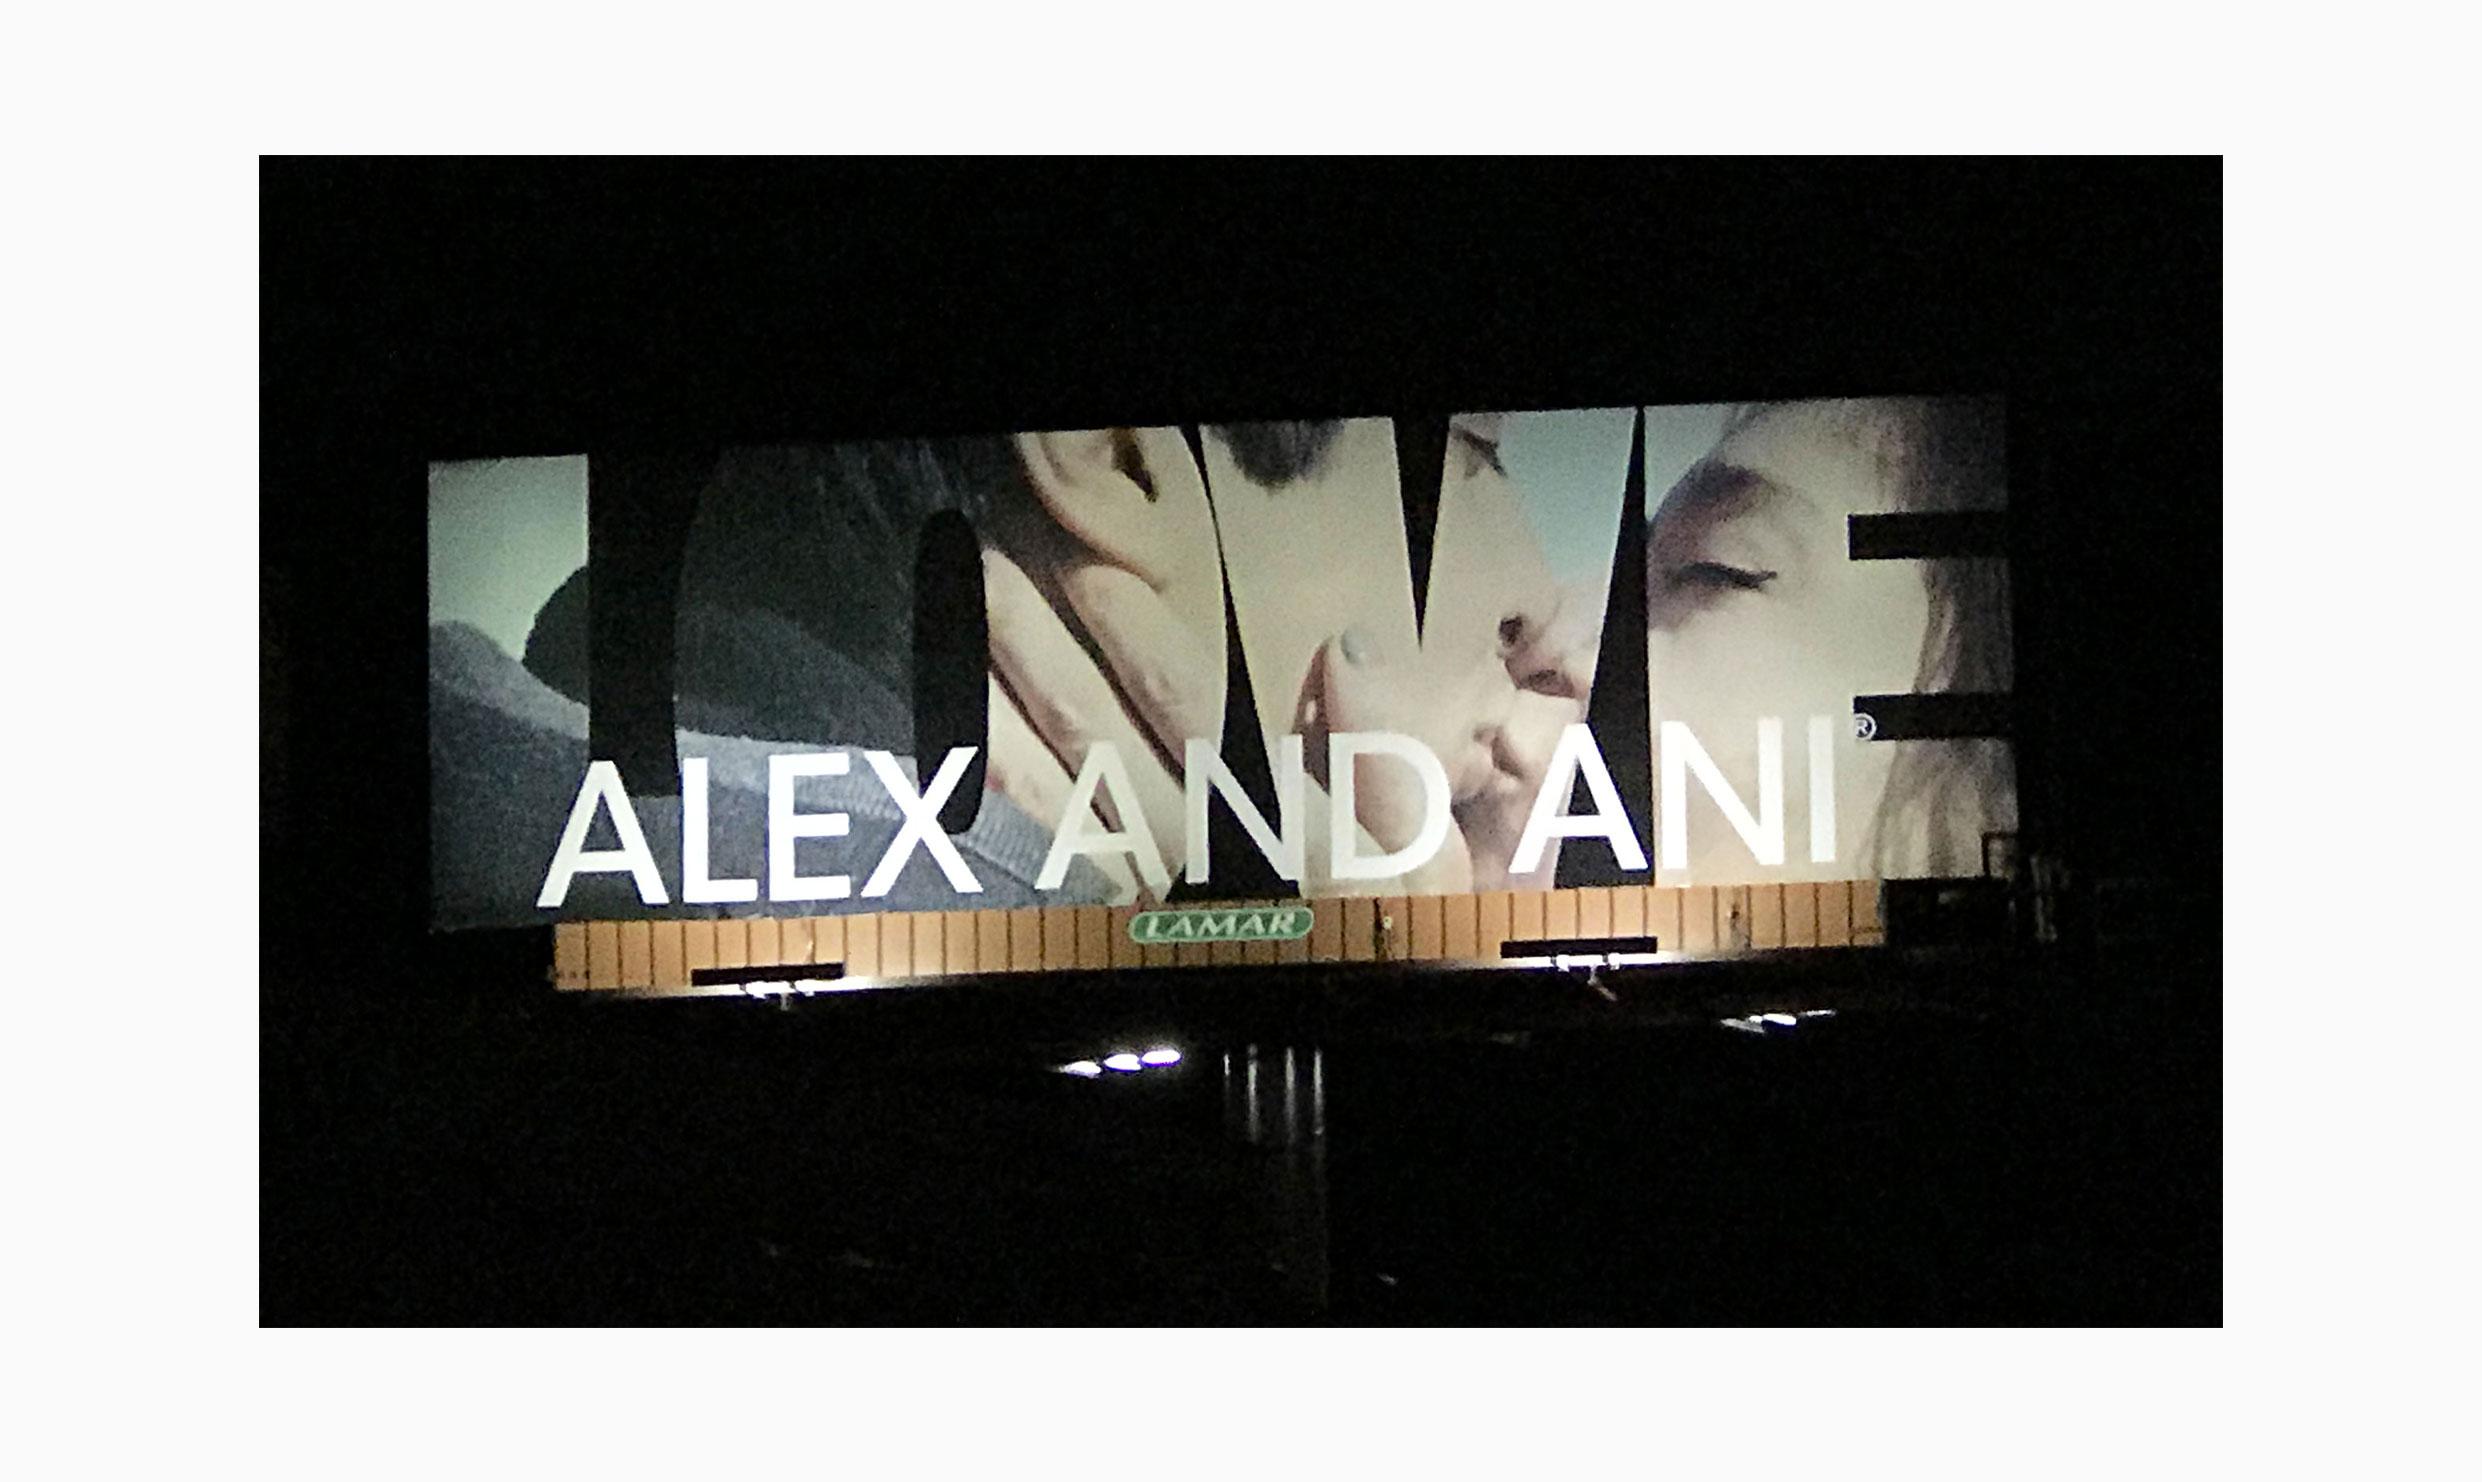 Billboard in Rhode Island, MA